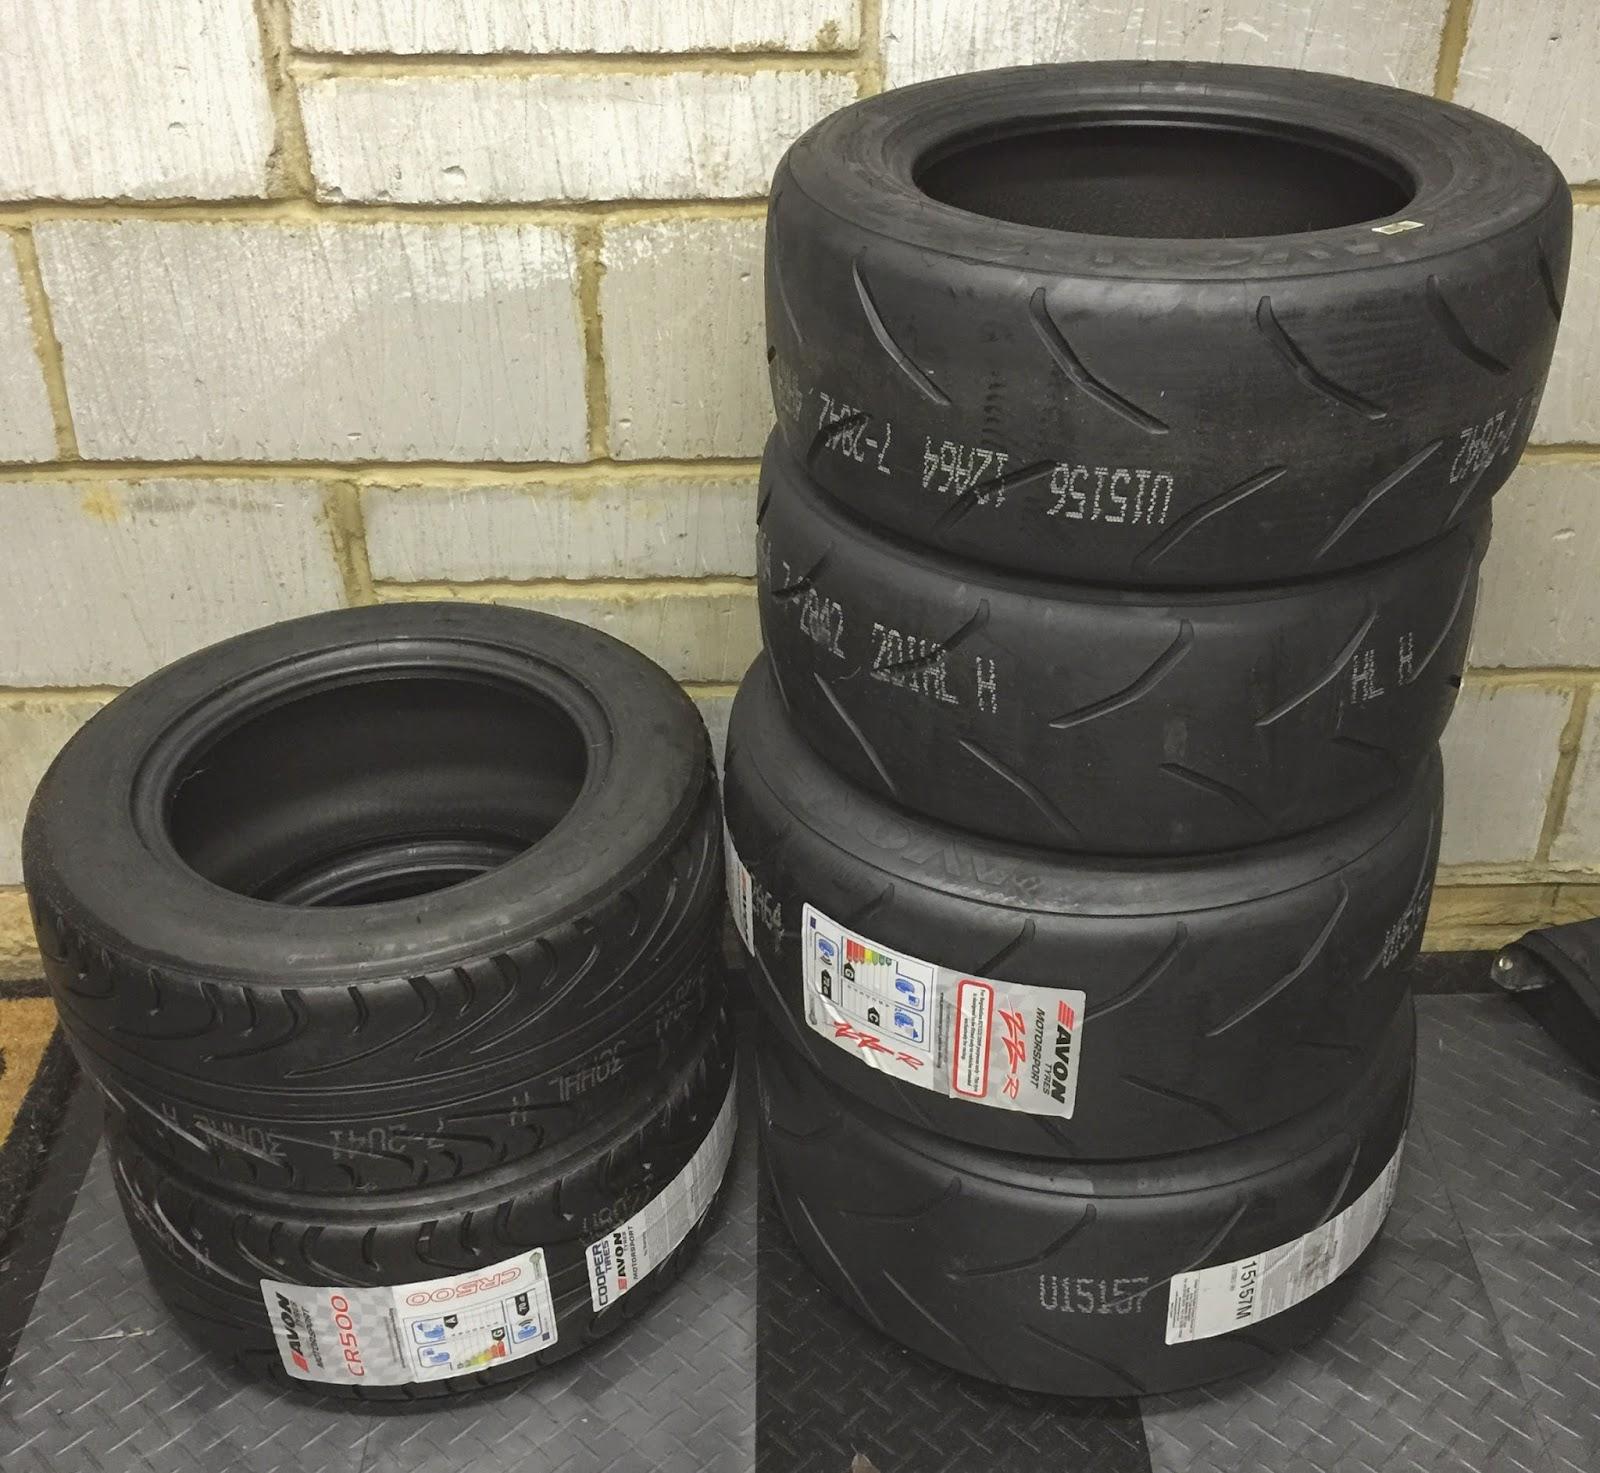 Caterham R 500: 2018 Caterham Roadsport Racing Blog: More Tyre And New